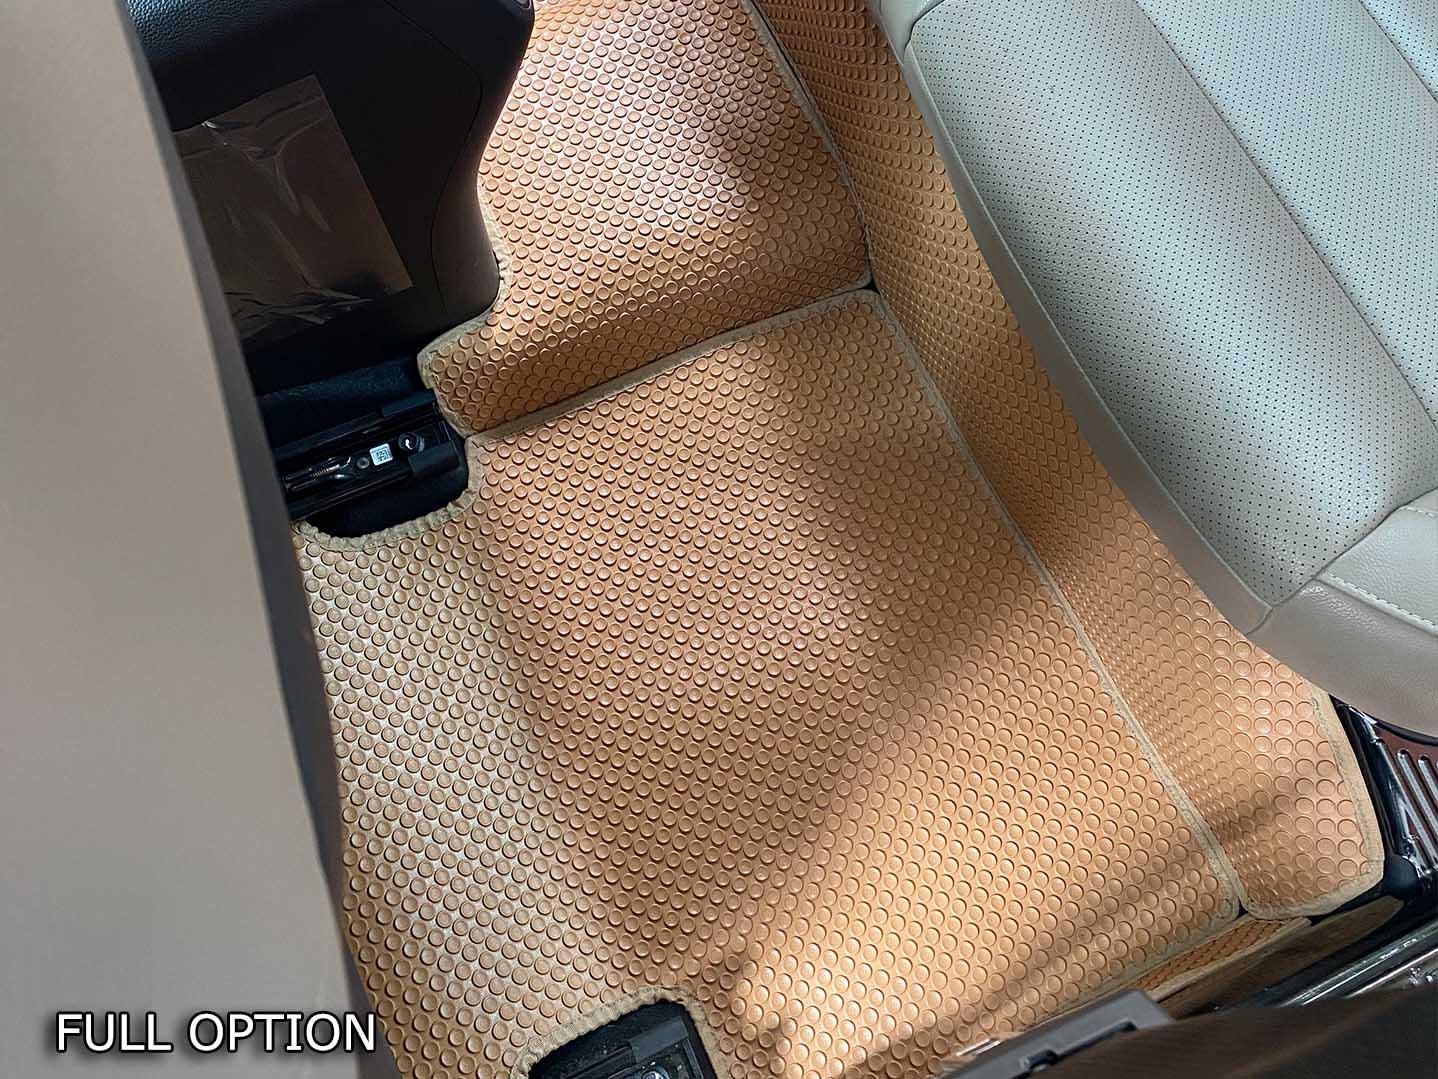 Thảm lót sàn Kia Cerato 2020 Full Option